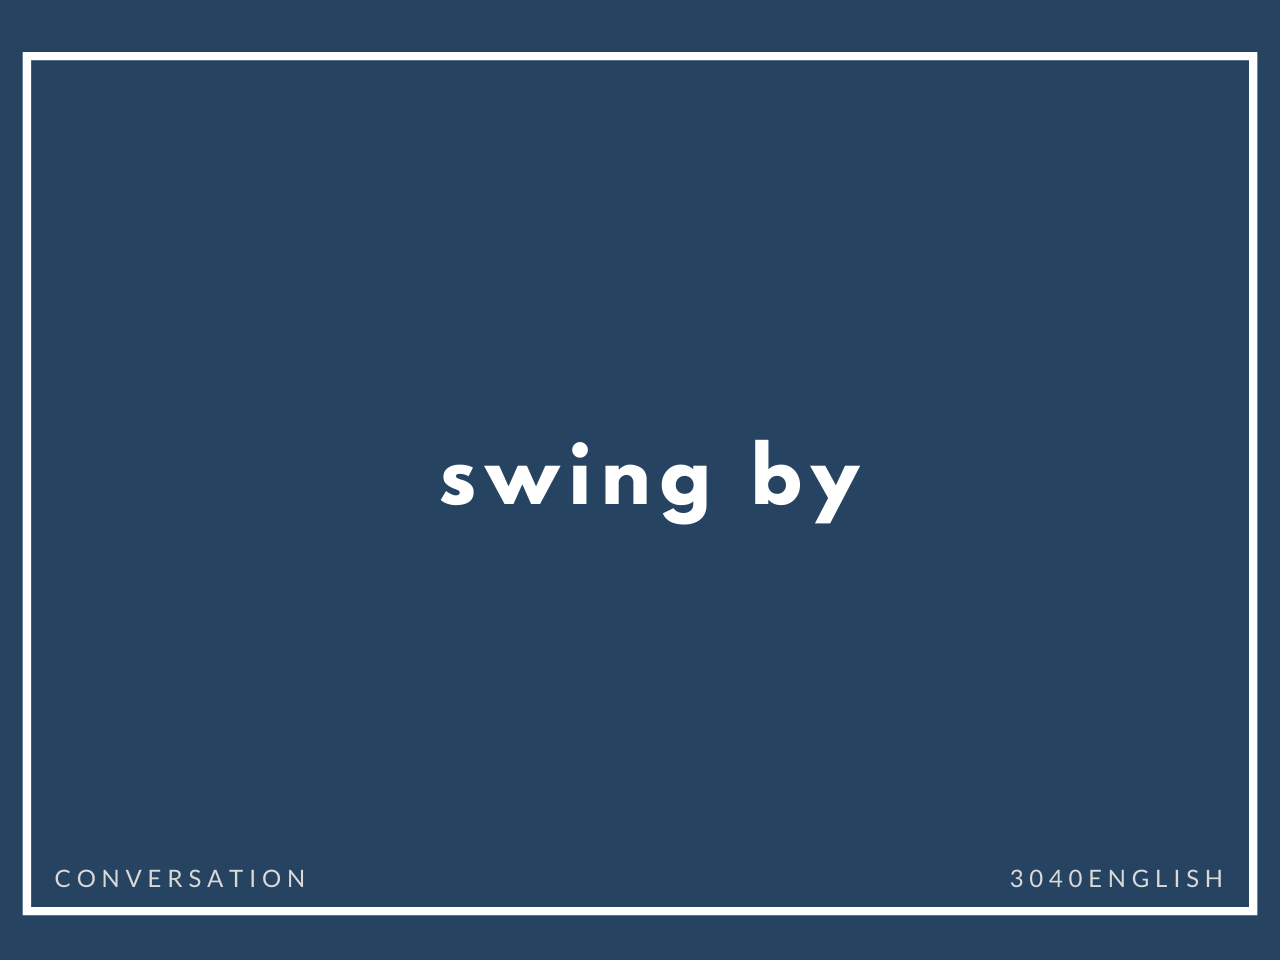 swing by の意味と簡単な使い方【音読用例文あり】